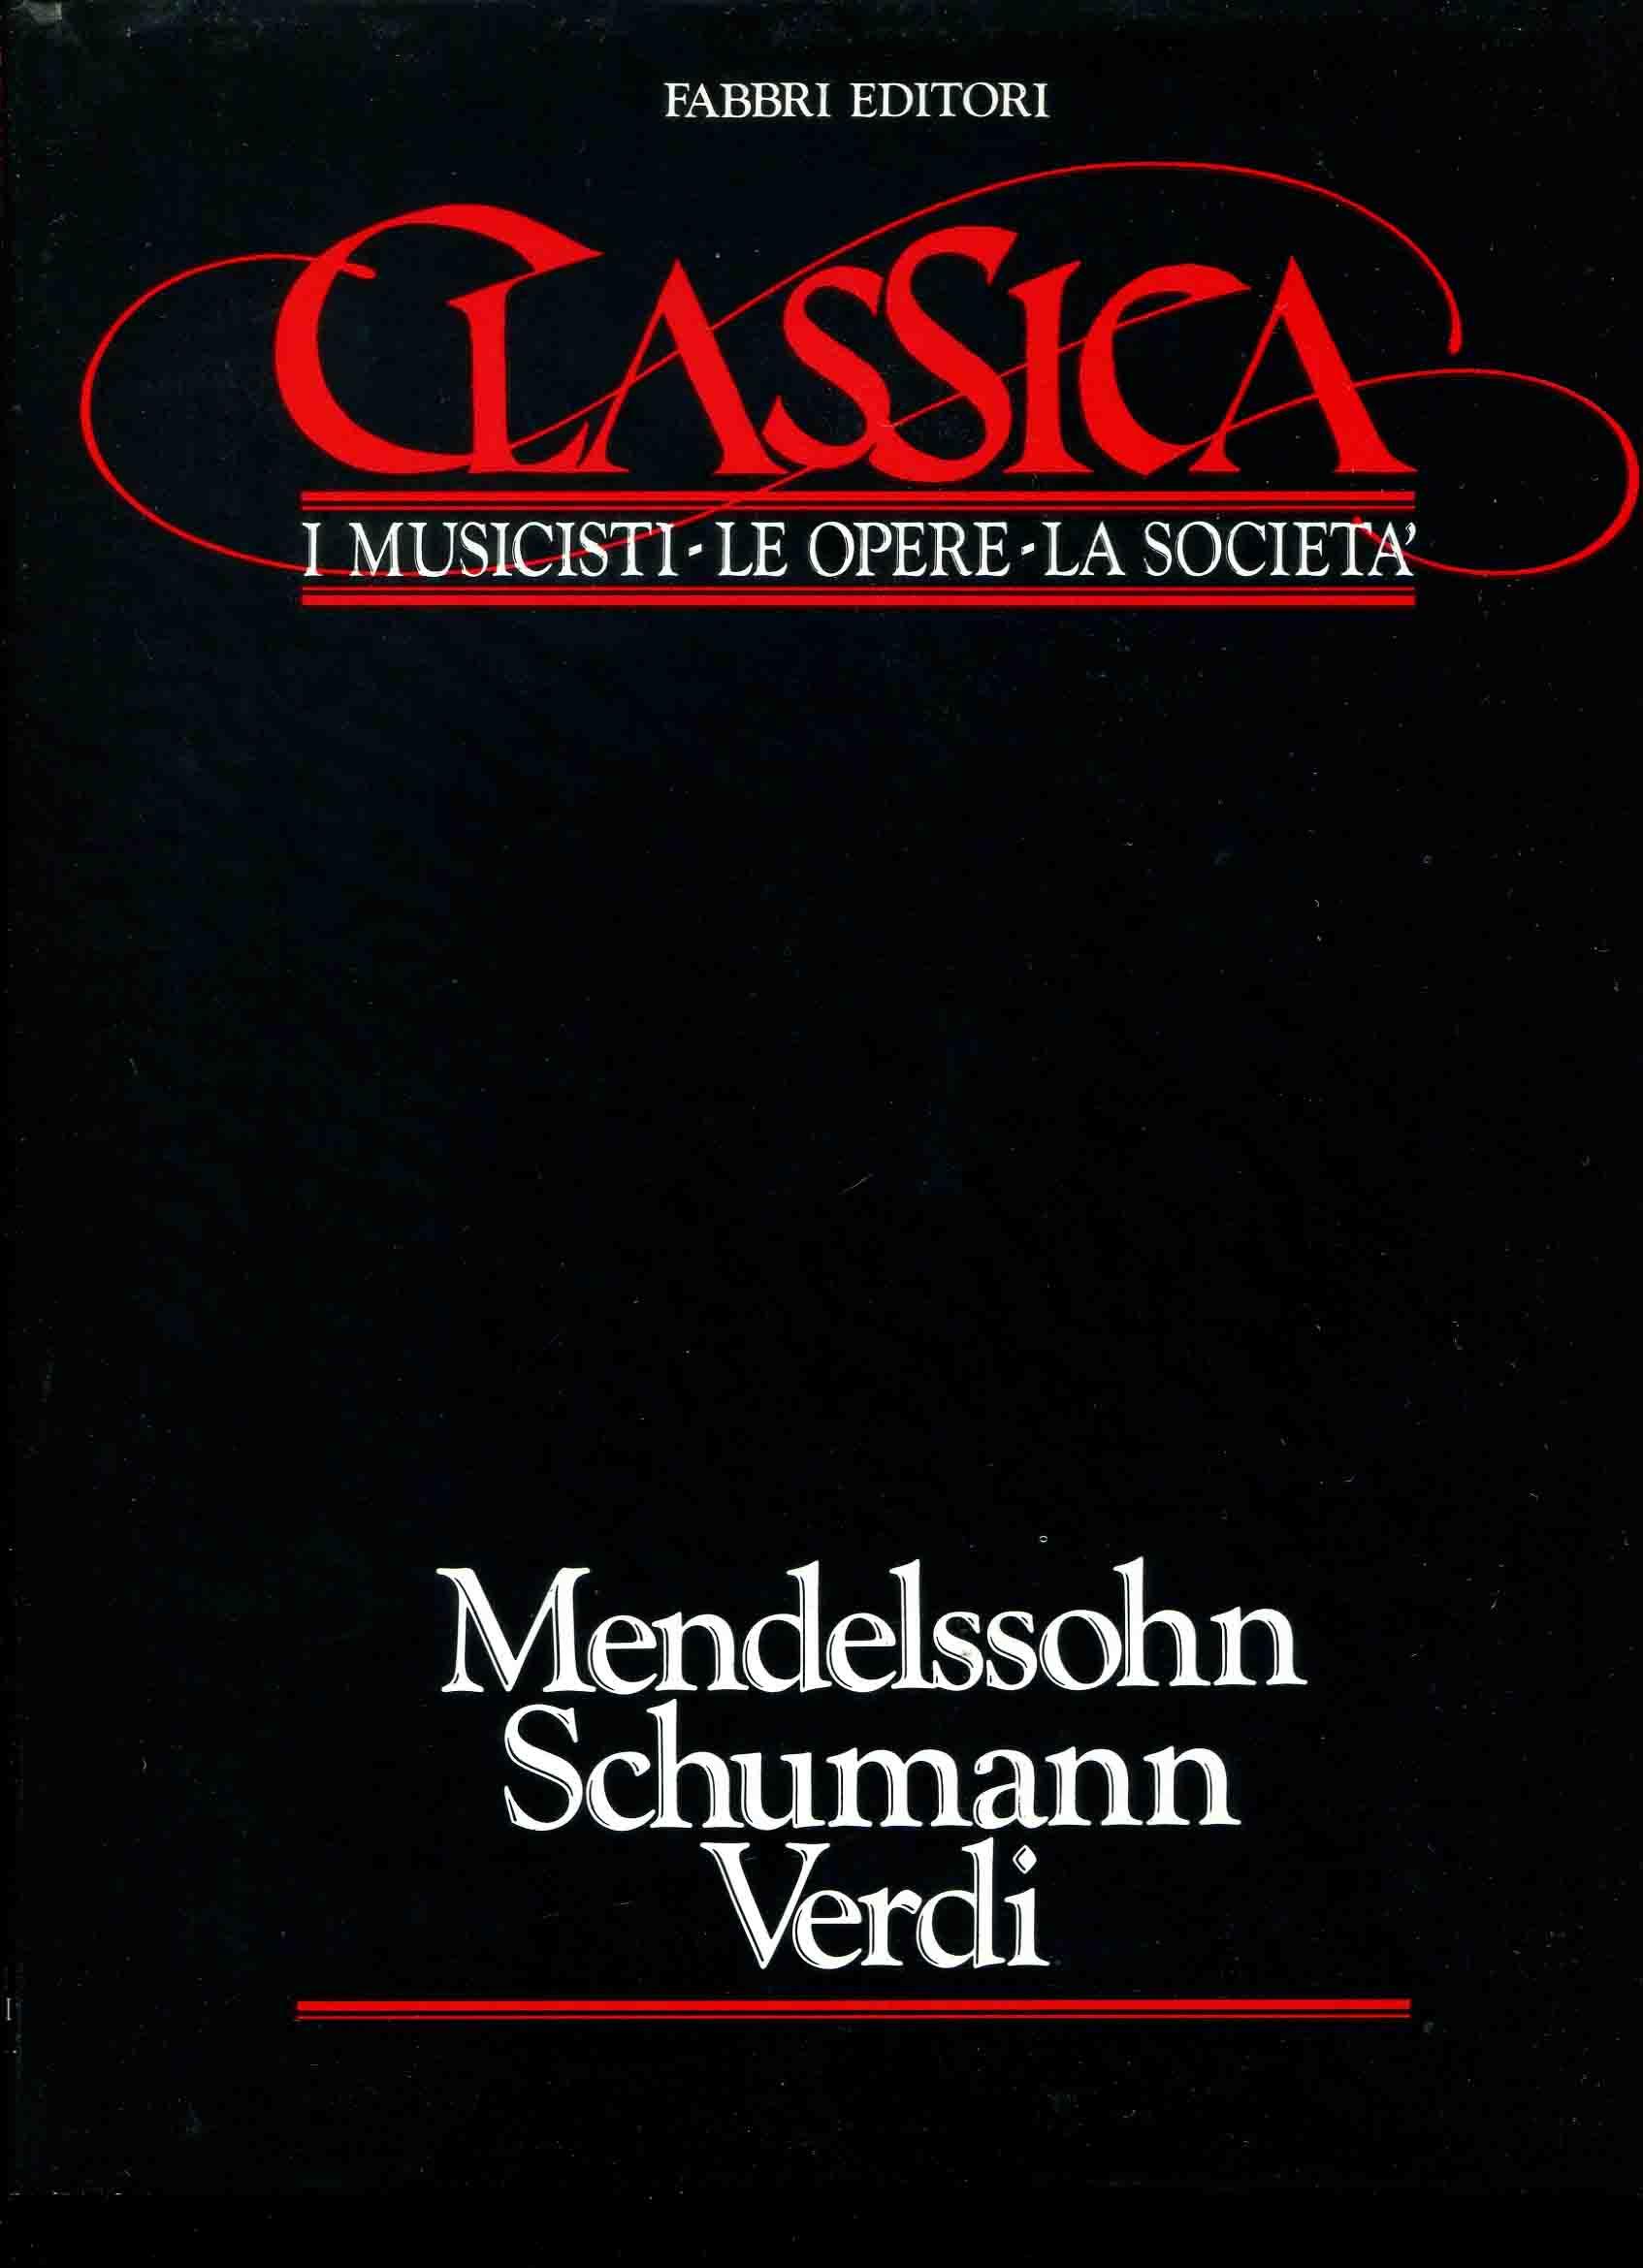 4: Mendelssohn, Schumann, Verdi